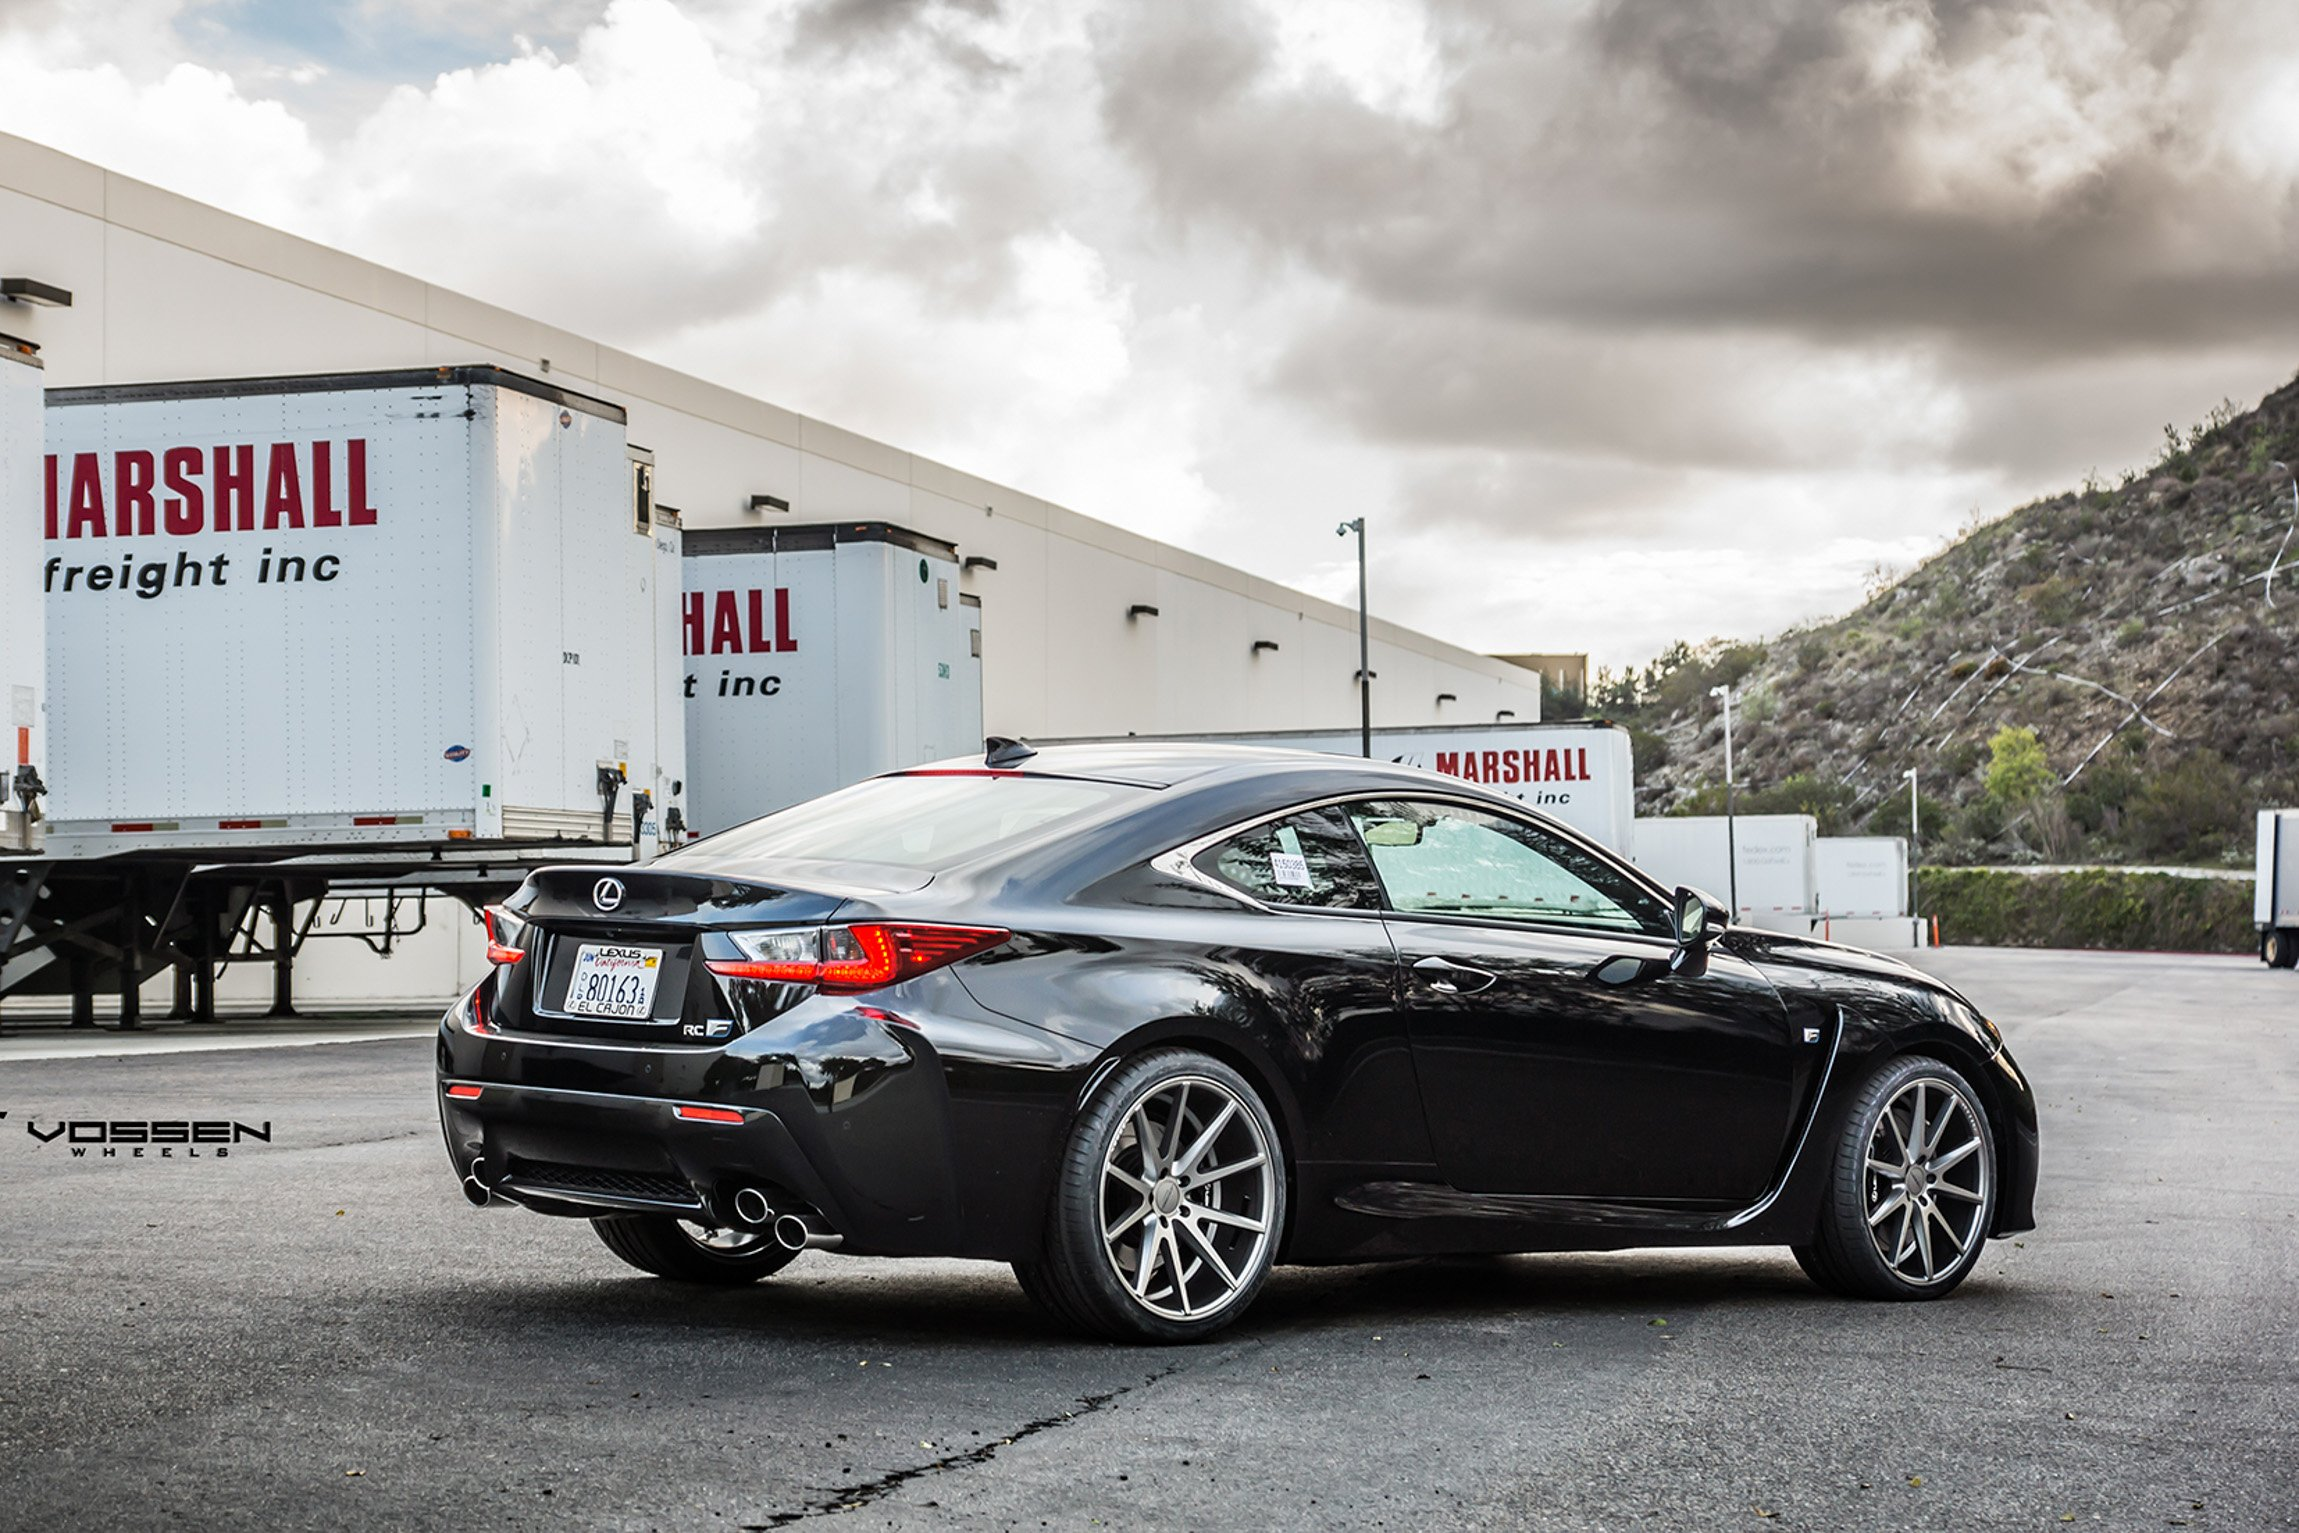 2015 Vossen Lexus Rf C Cars Coupe Tuning Wheels Wallpaper